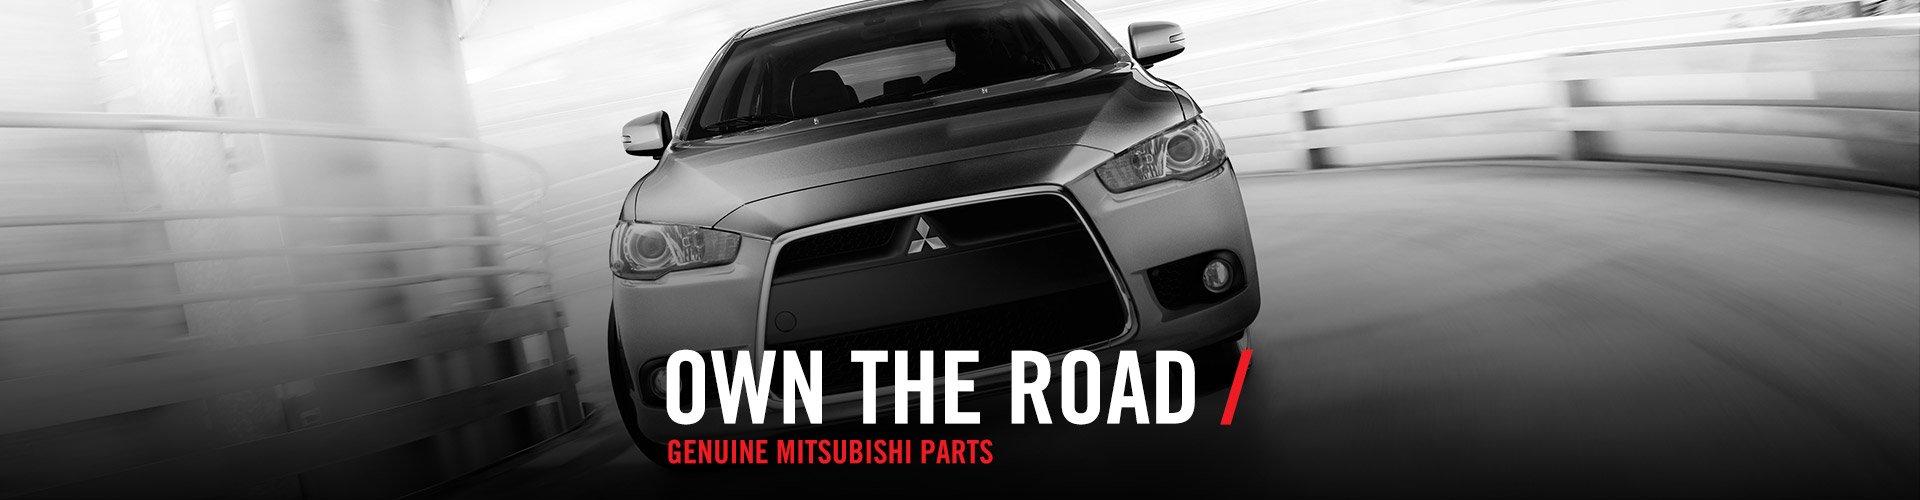 Genuine Mitsubishi Parts